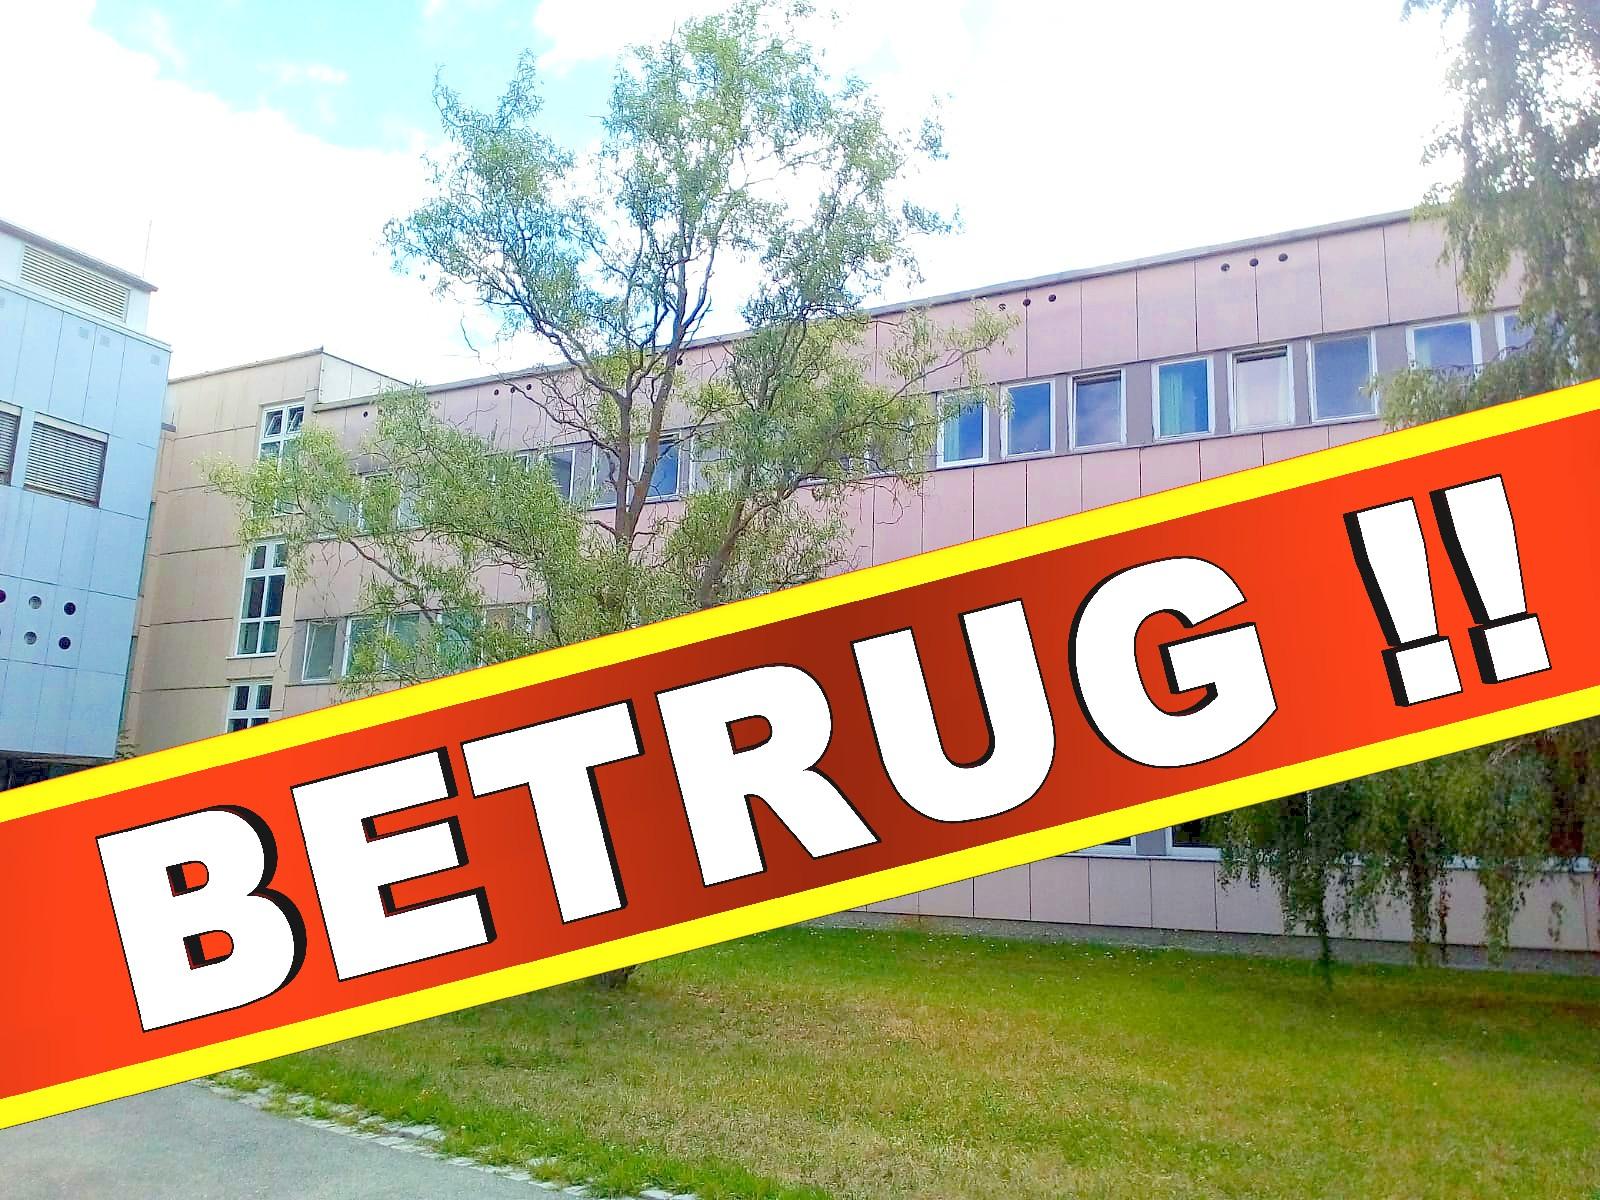 Bezirksklinikum Obermain Kutzenberg, 96250 Ebensfeld Psychiatrie Polizei Krankenhaus